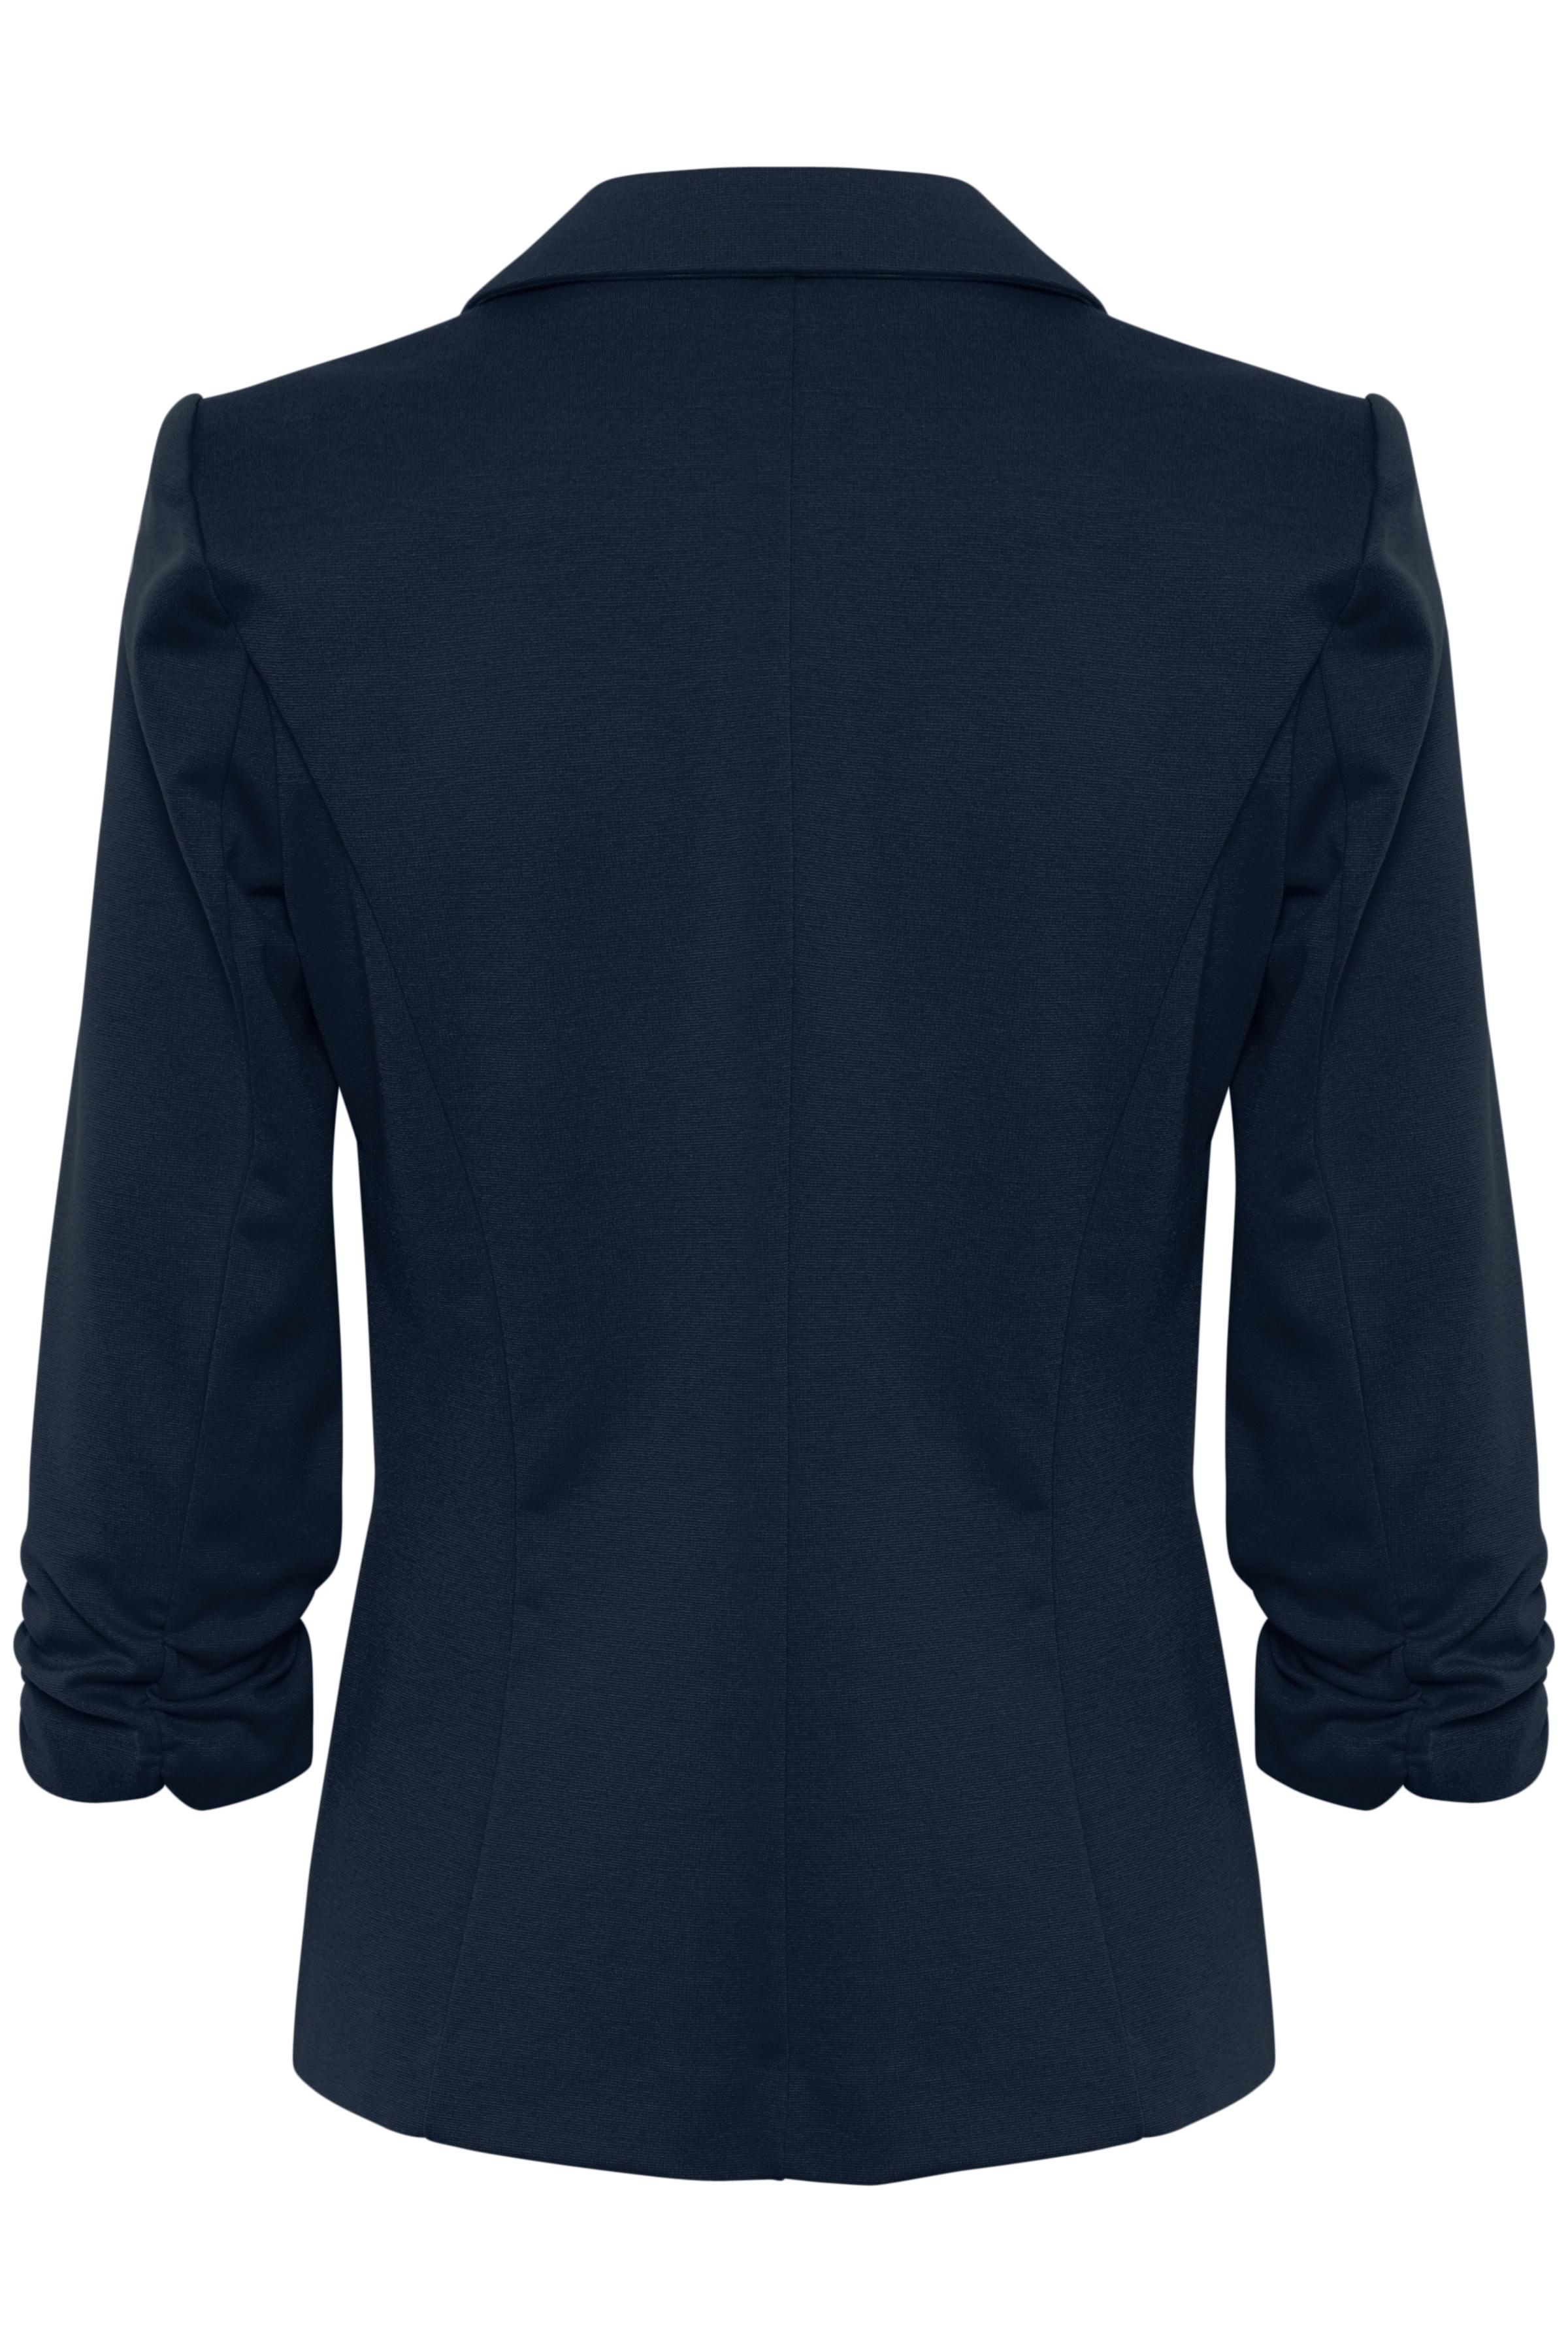 Marineblå Blazer fra Fransa – Køb Marineblå Blazer fra str. XS-XXL her